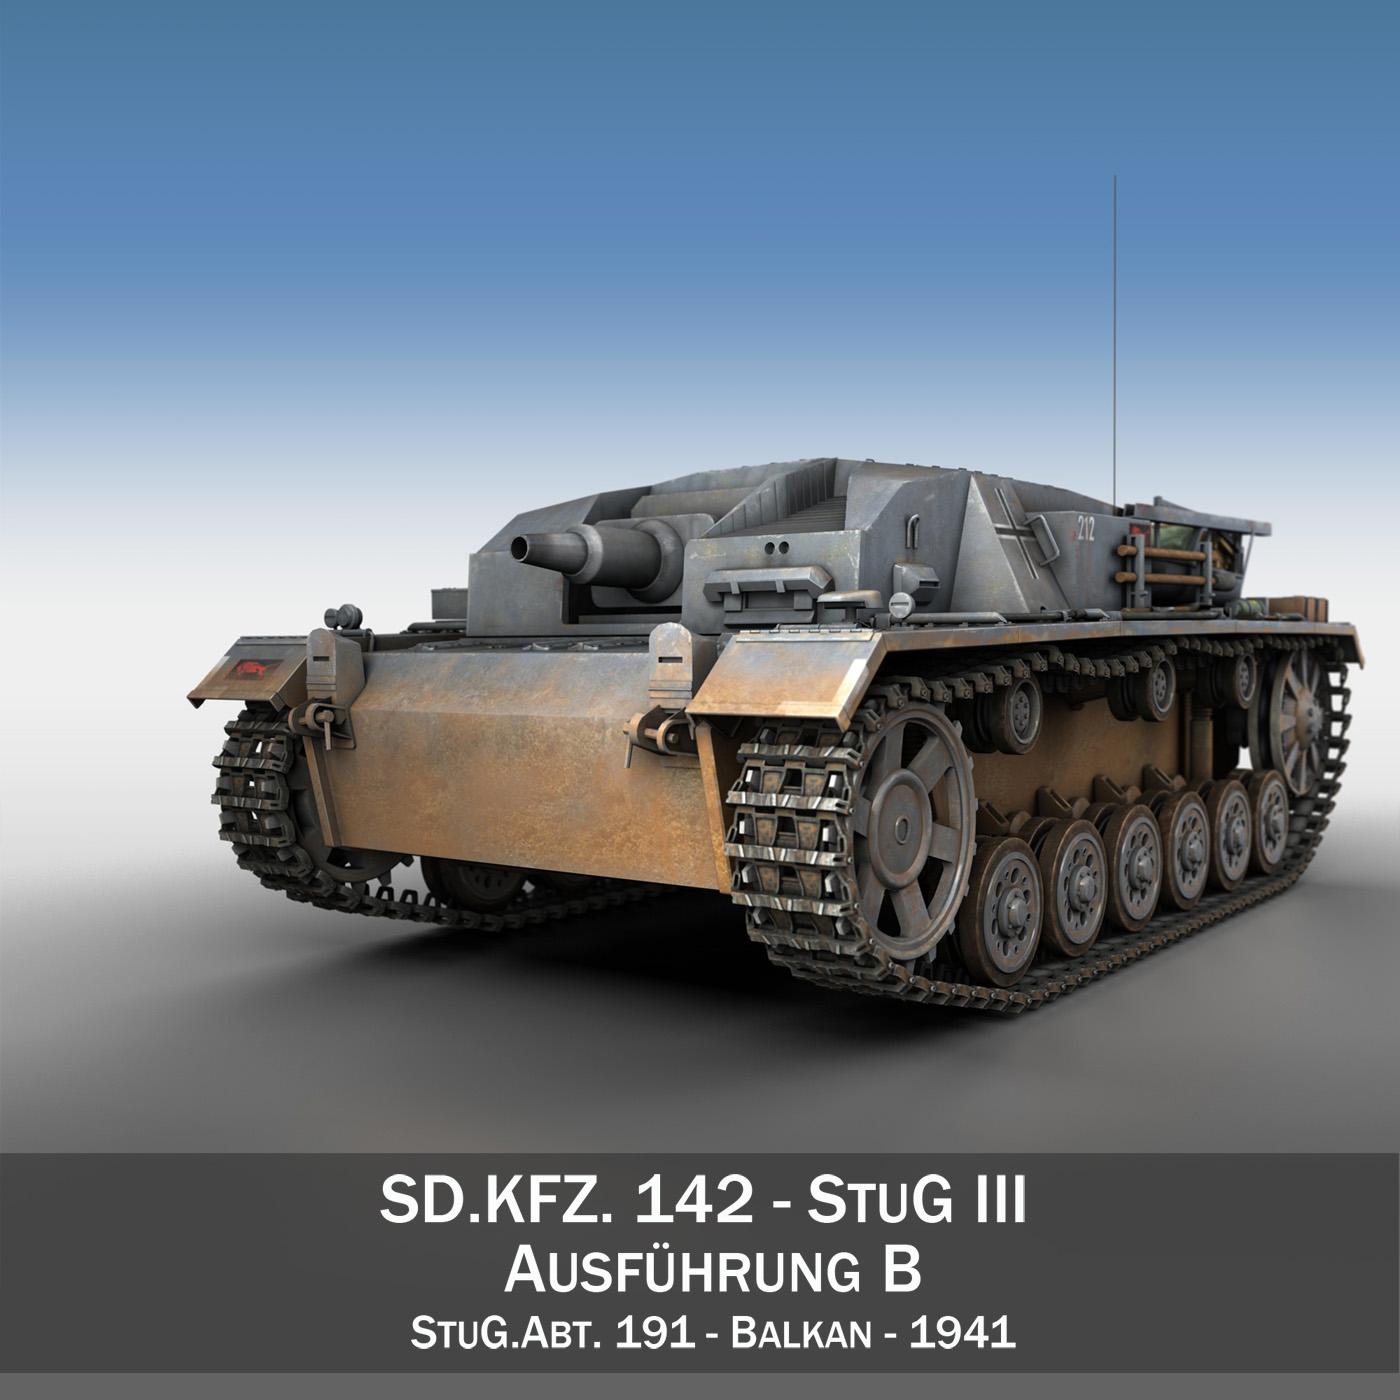 stug iii – ausf.b – stug abt 191 3d model 3ds fbx c4d lwo obj 282644